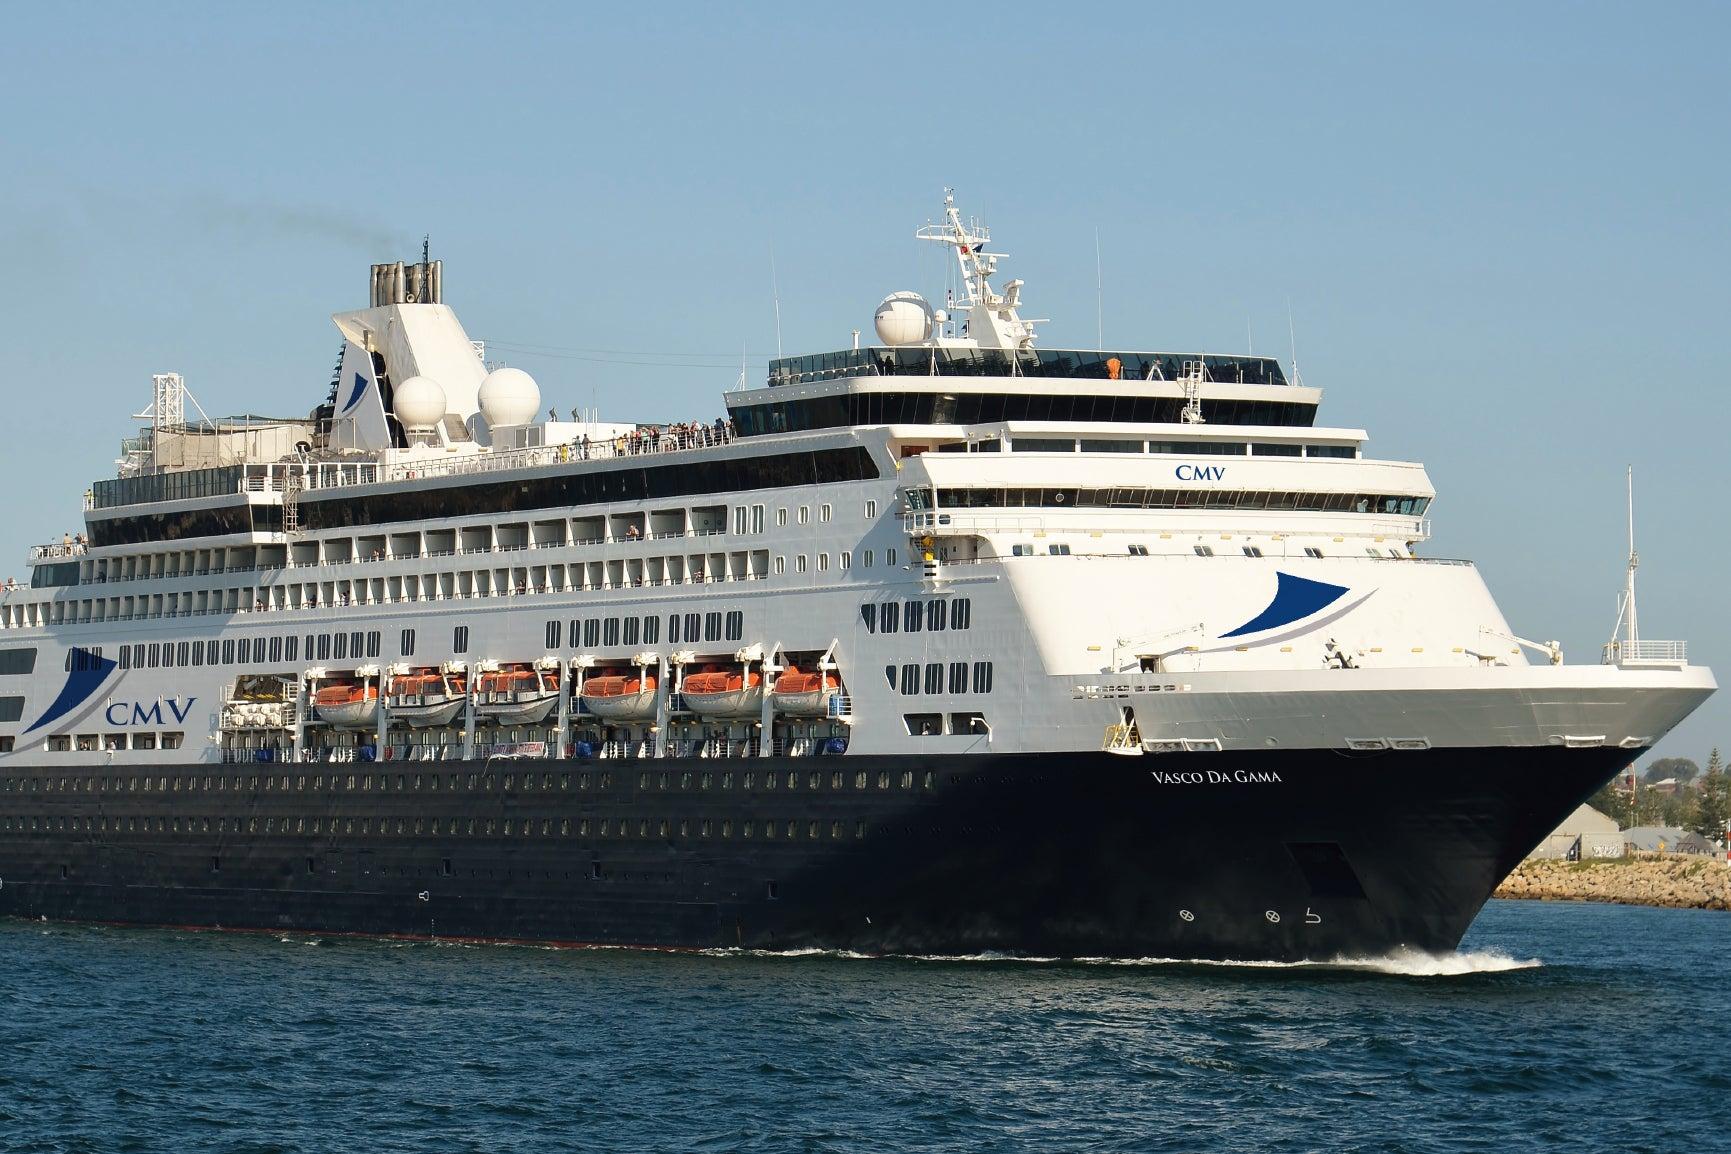 Cruise ship left drifting off coast of Australia after power 'blacko…